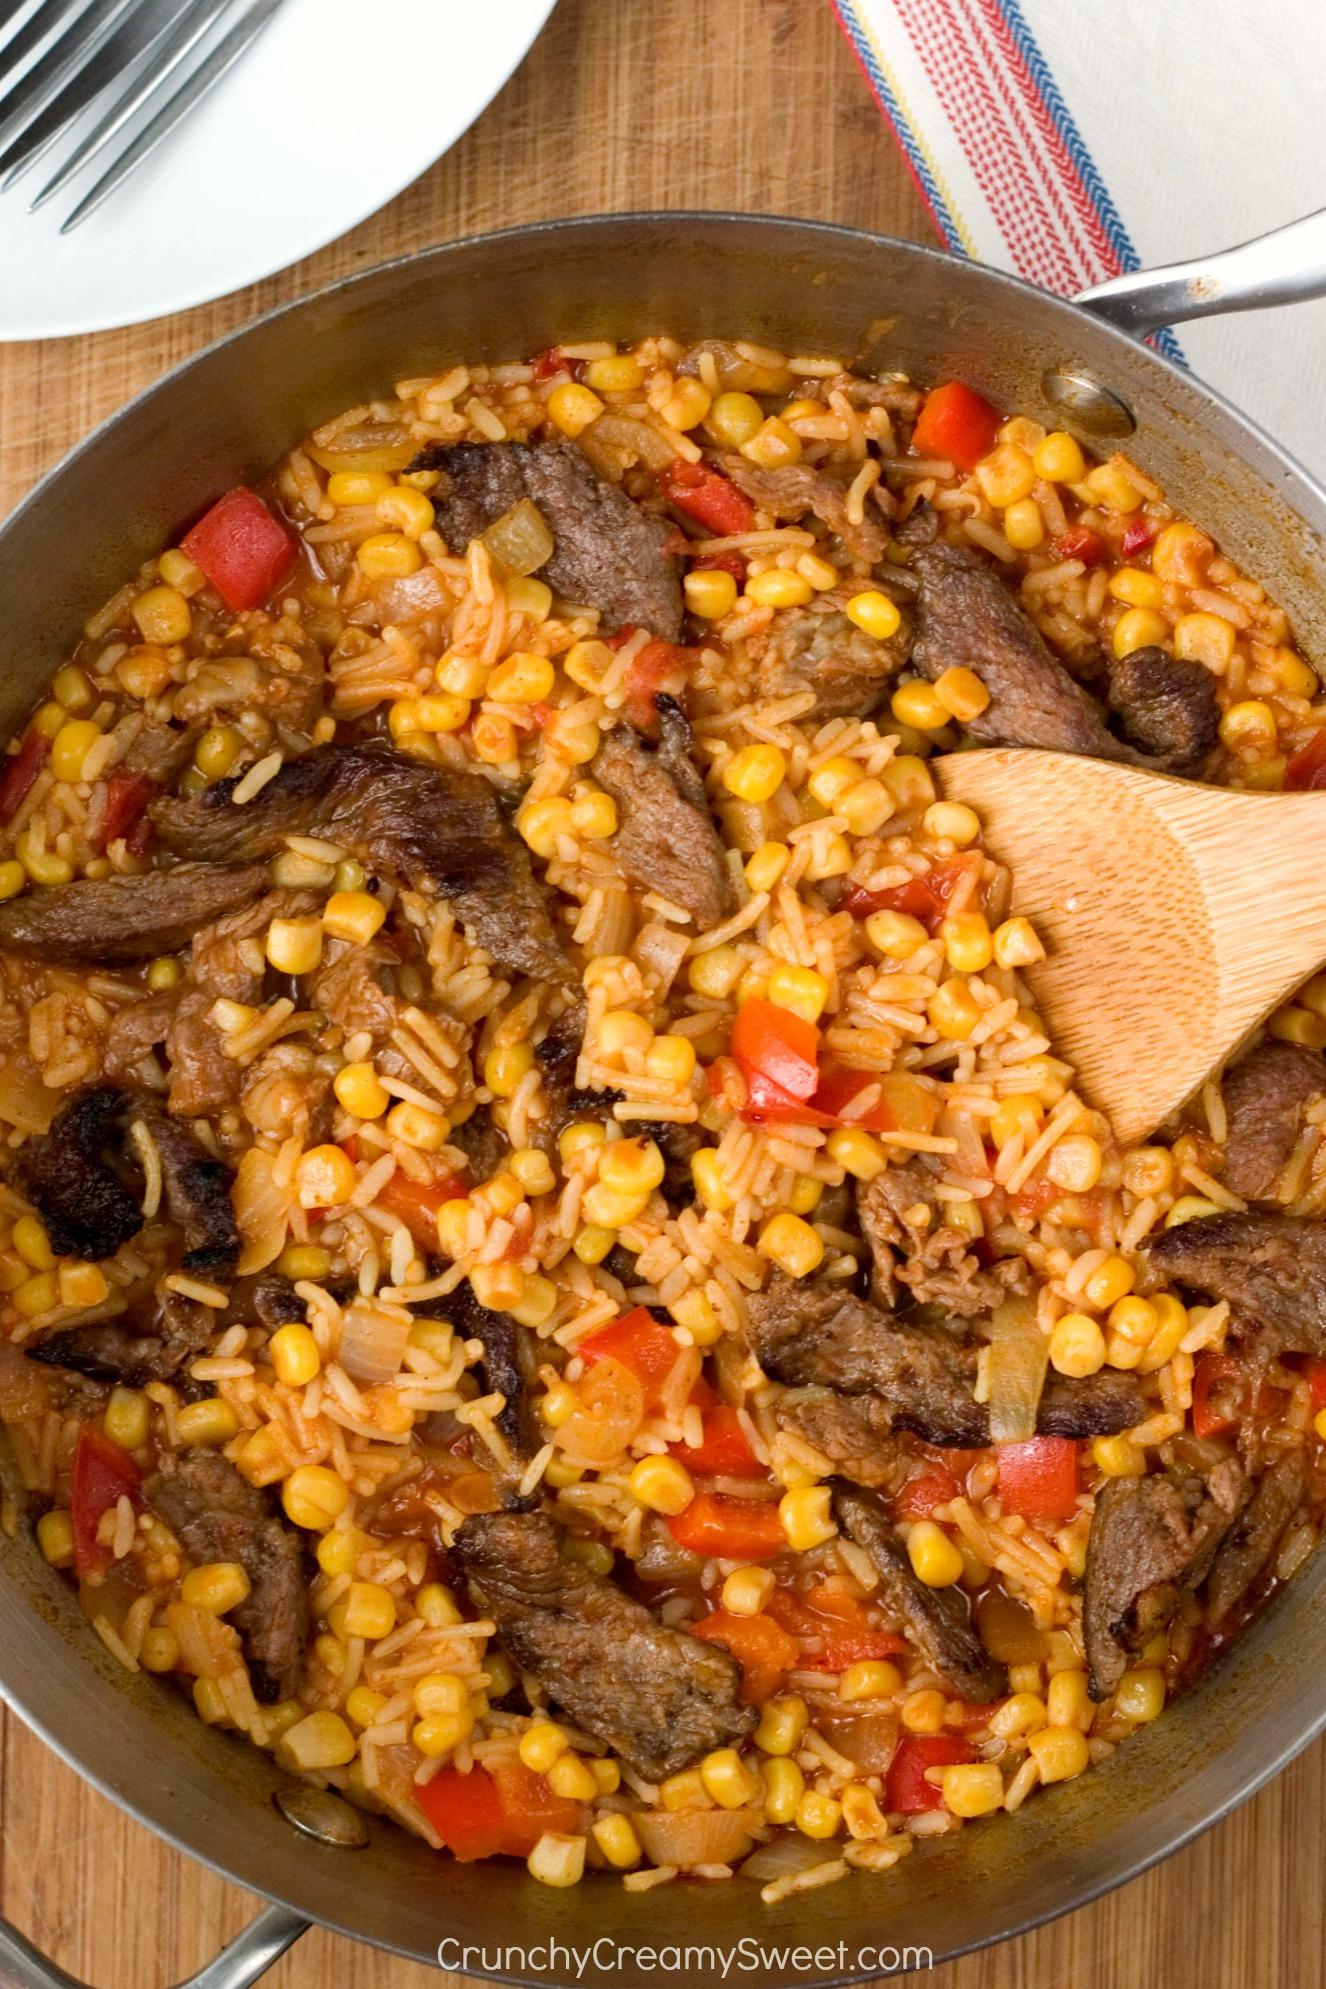 Fiesta Fried Rice Crunchy Creamy Sweet